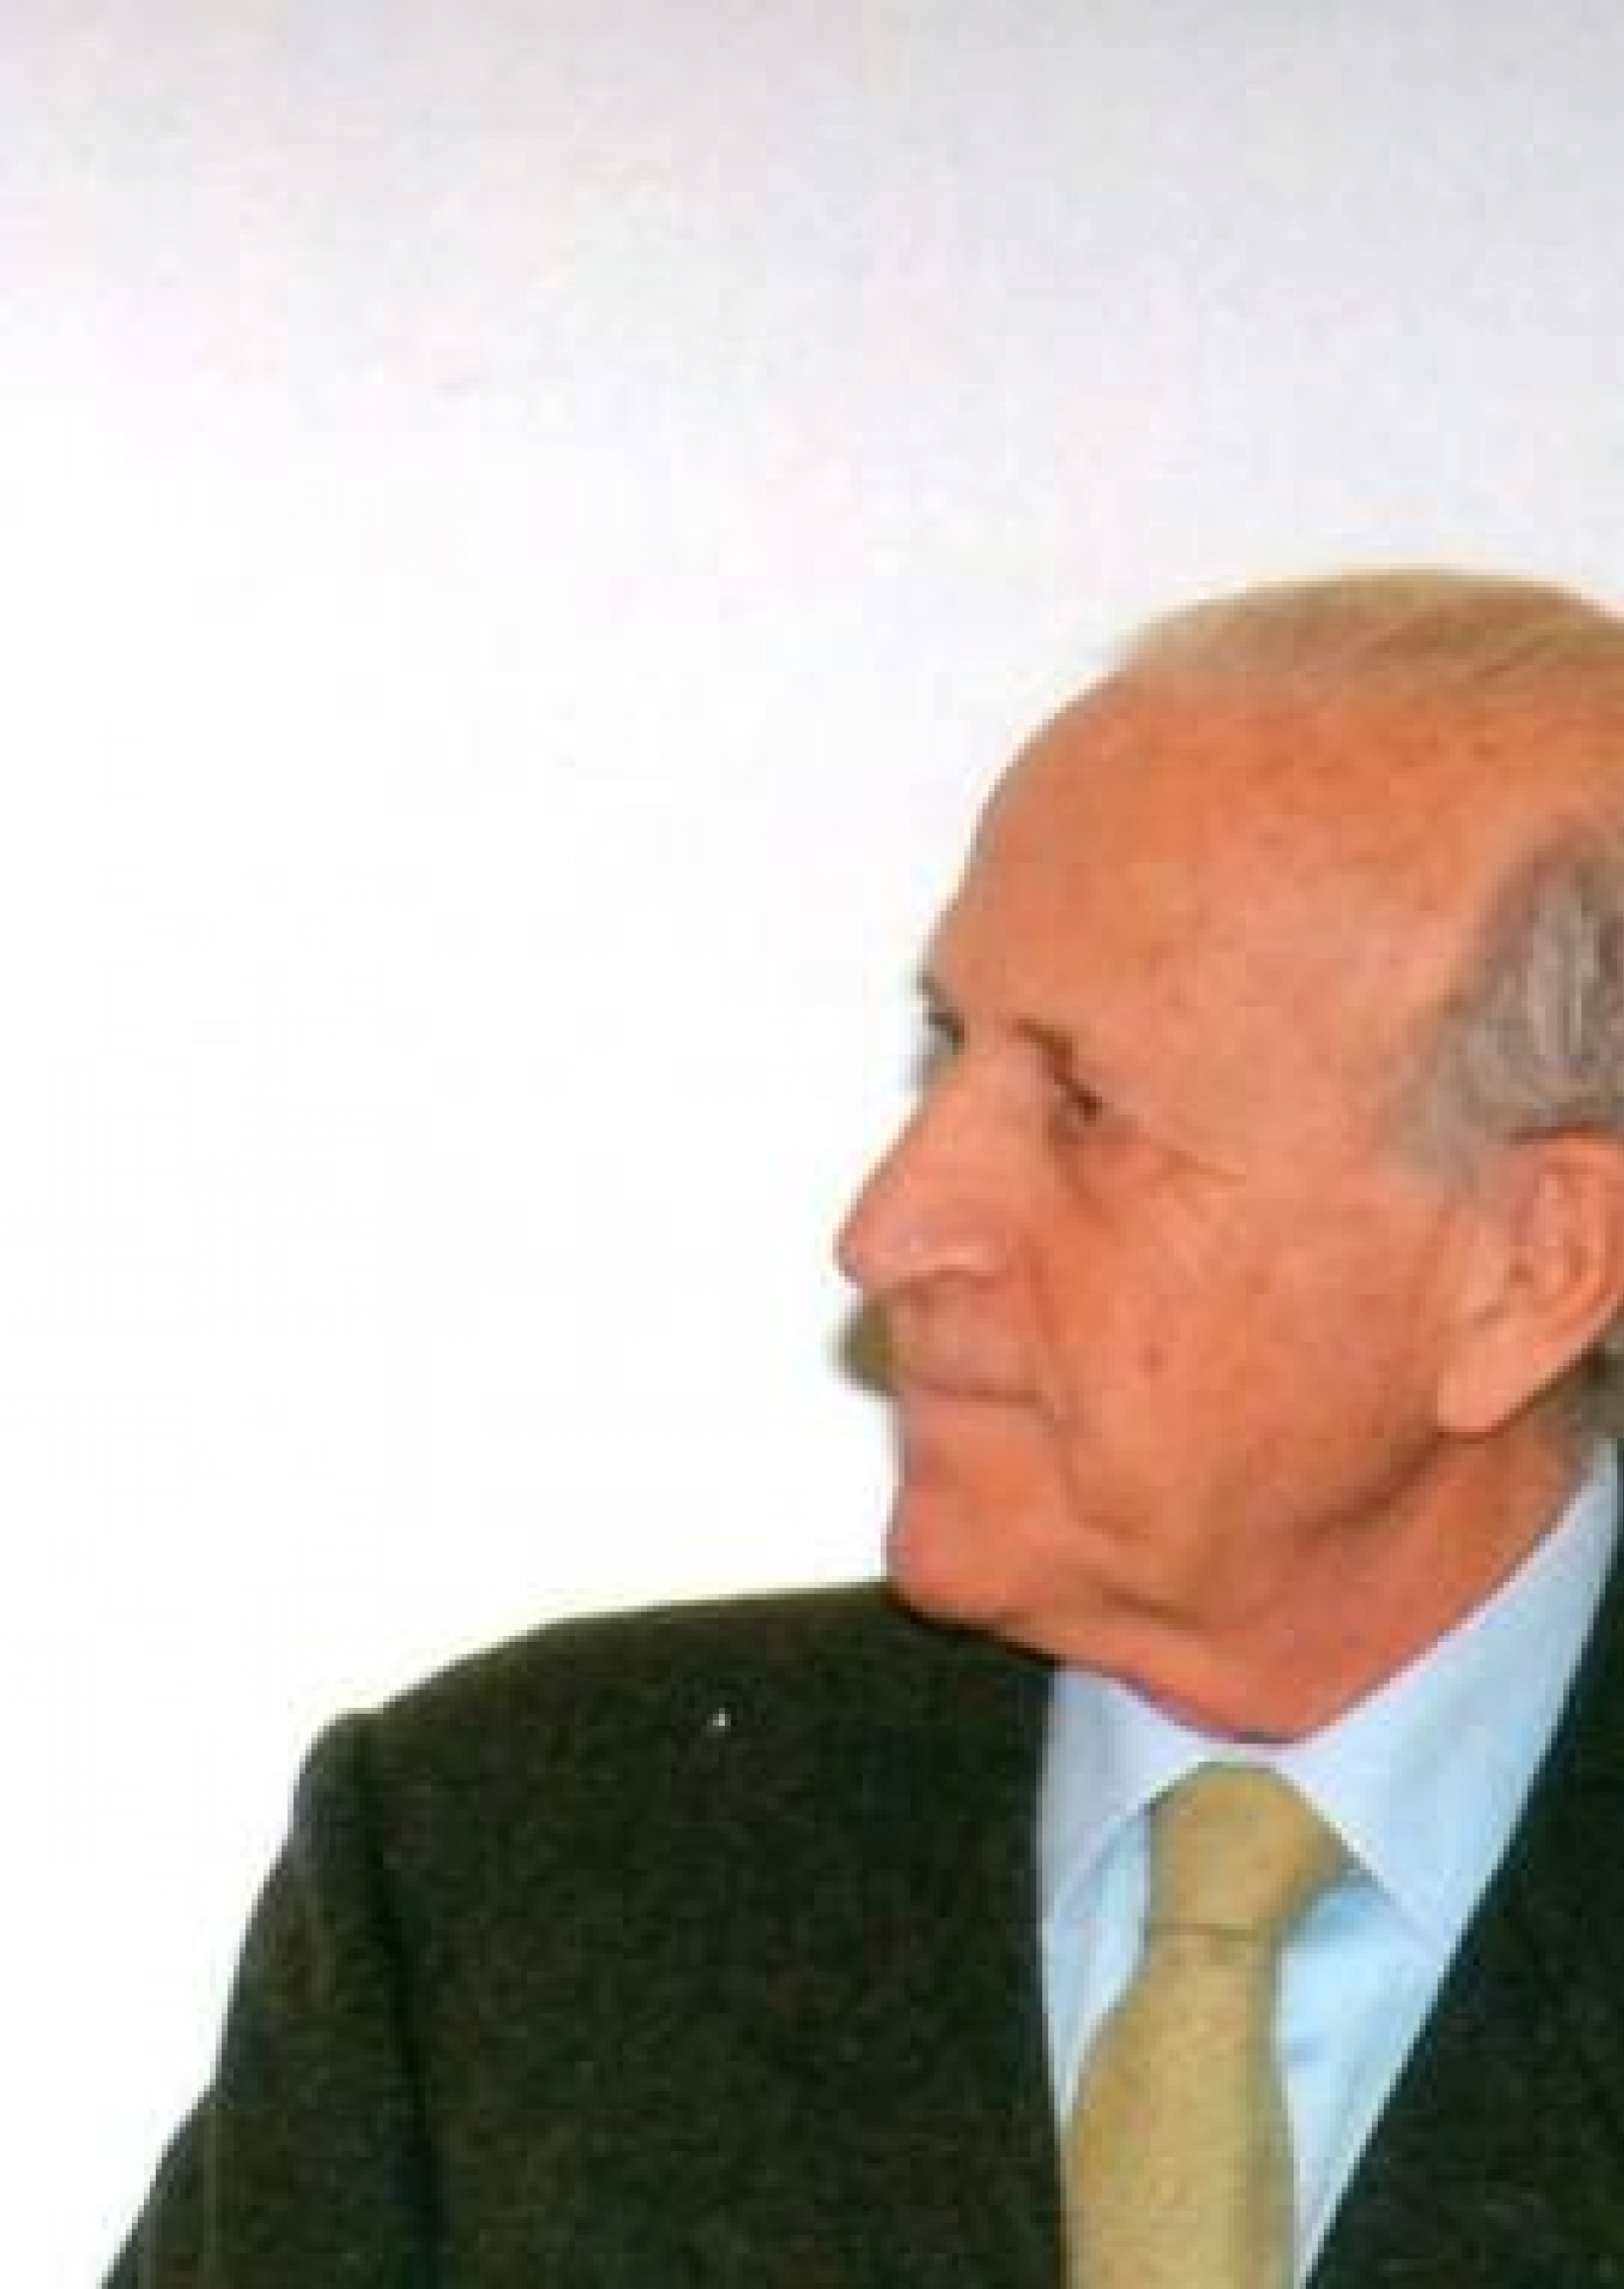 Gianfrancesco Montedoro